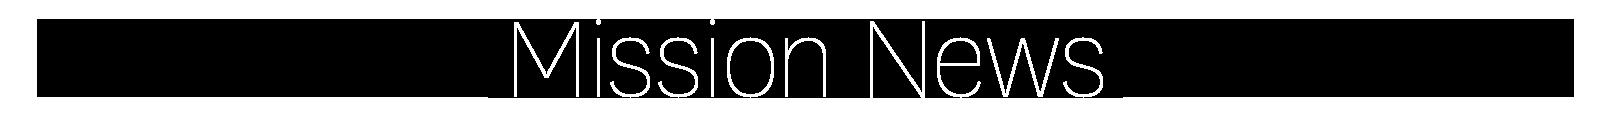 Mission-news